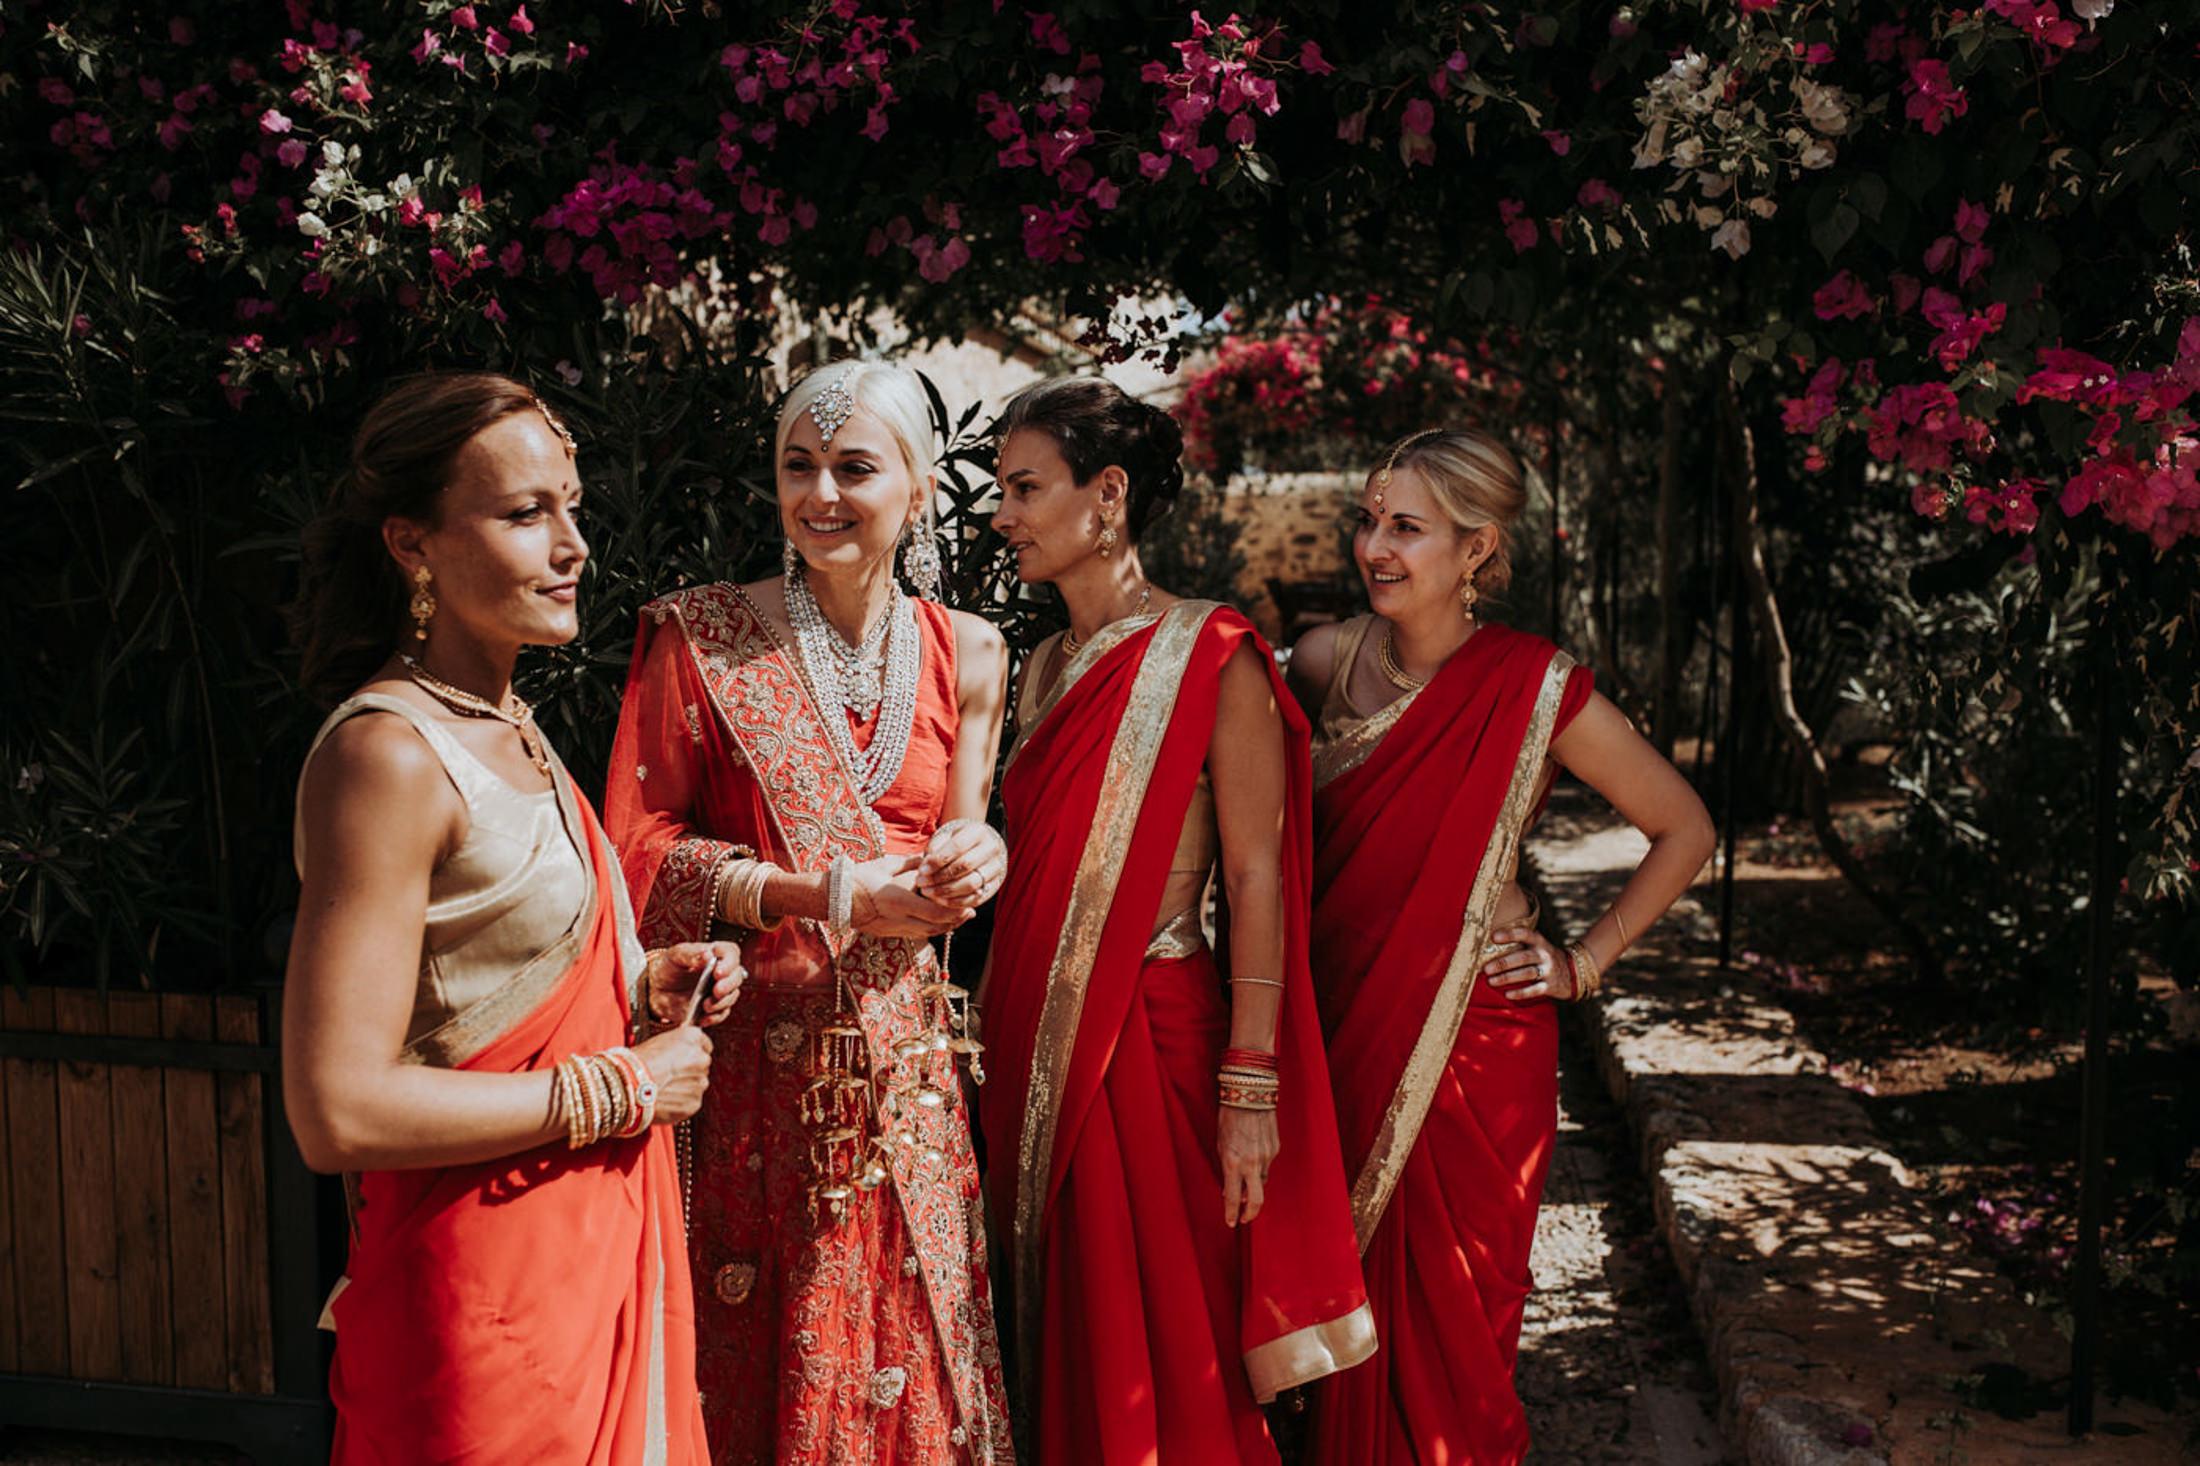 Wedding_Photographer_Mallorca_Daniela-Marquardt_Photography_New_York_Iceland_Tuscany_Santorini_Portugal_Austria_Bavaria_Elopement_Hochzeitsfotograf_AntjeRajat2_22